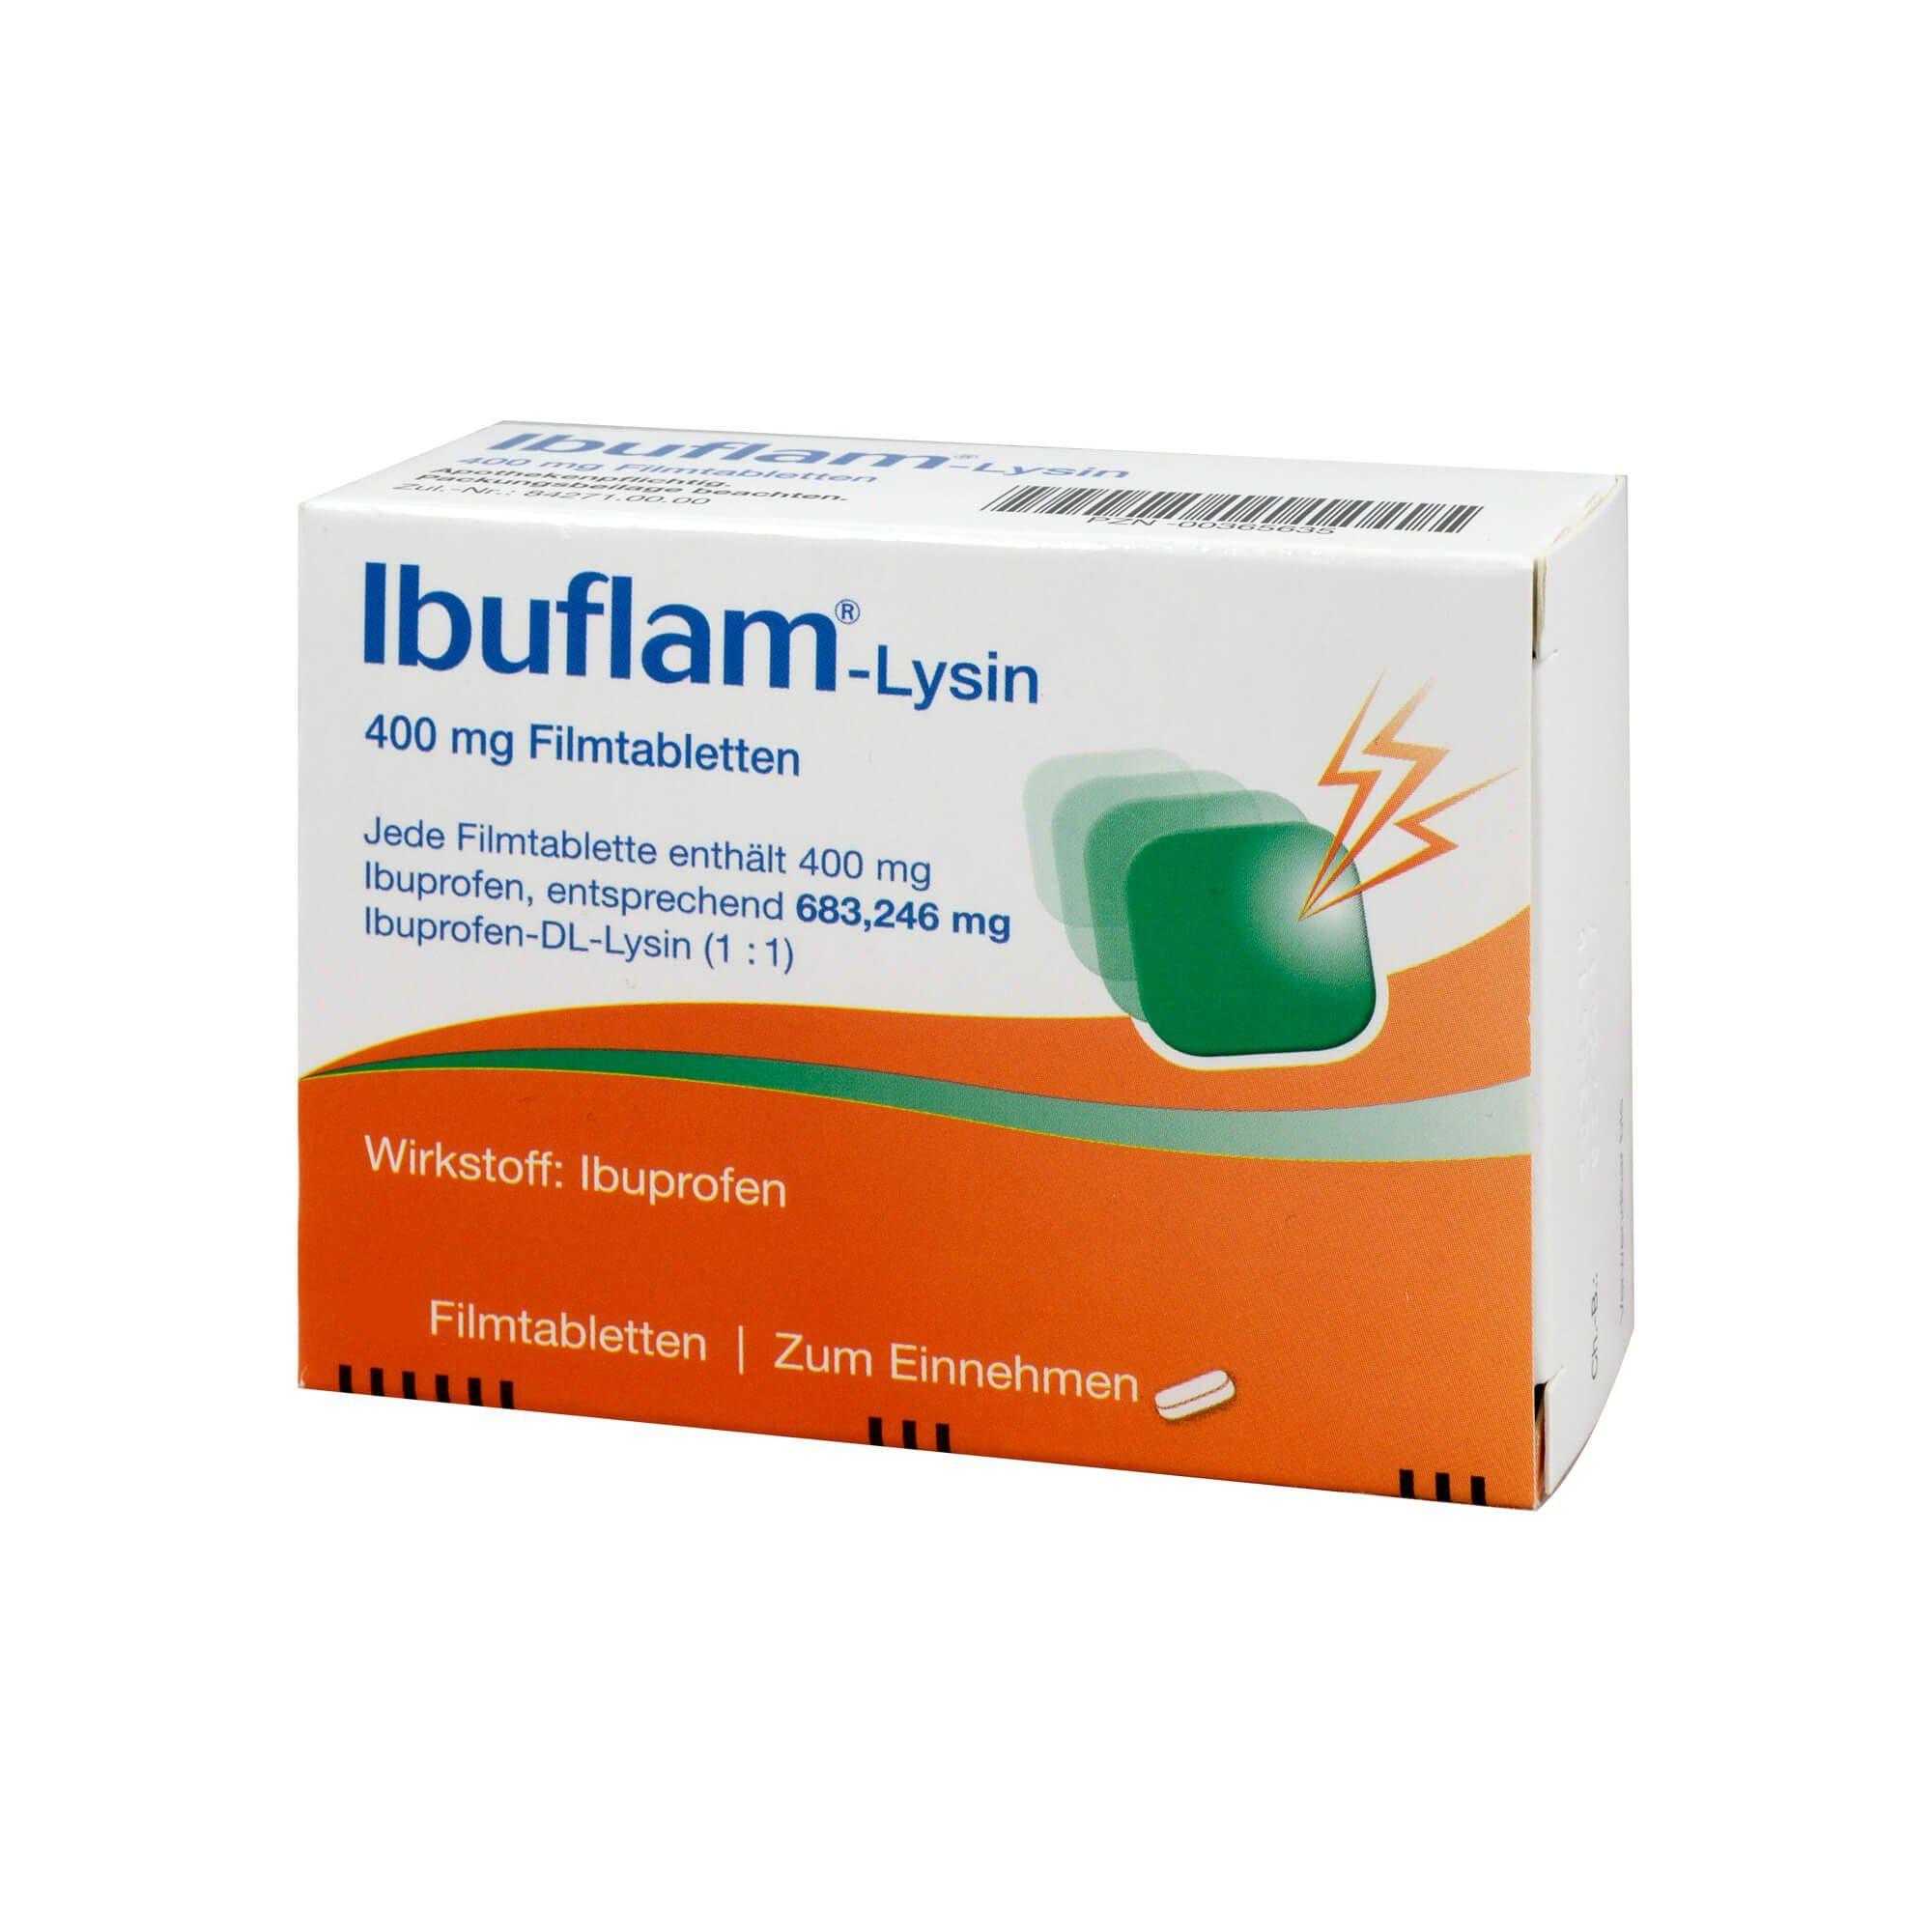 Ibuflam Ibuflam-Lysin 400 mg Filmtabletten , 12 St